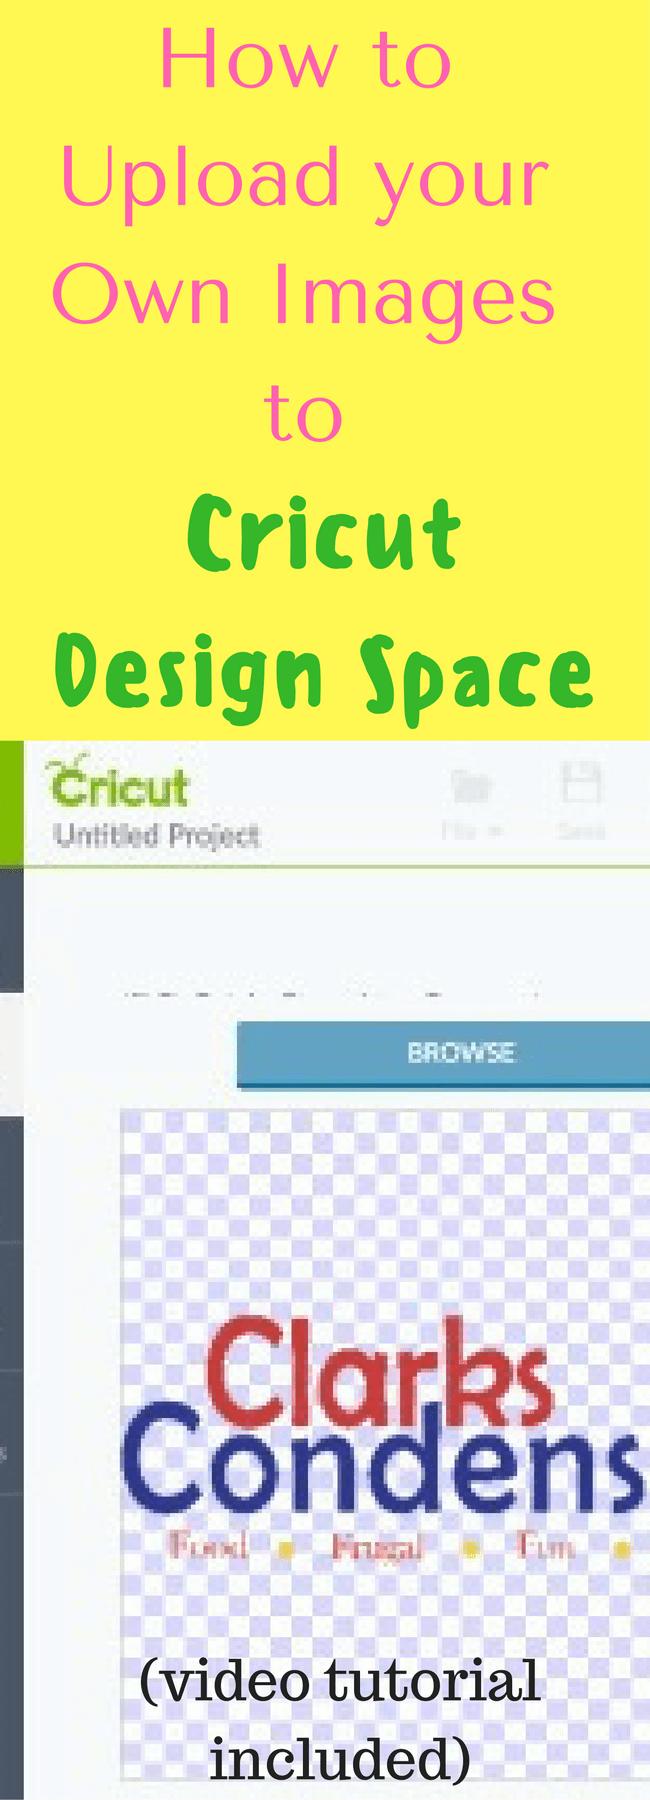 Cricut / Cricut Explore Air / Cricut Tutorial / Cricut Design Space / Cricut Tutorials / Cricut Projects / Cricut How-tos / How to Use Cricut Machine via @clarkscondensed